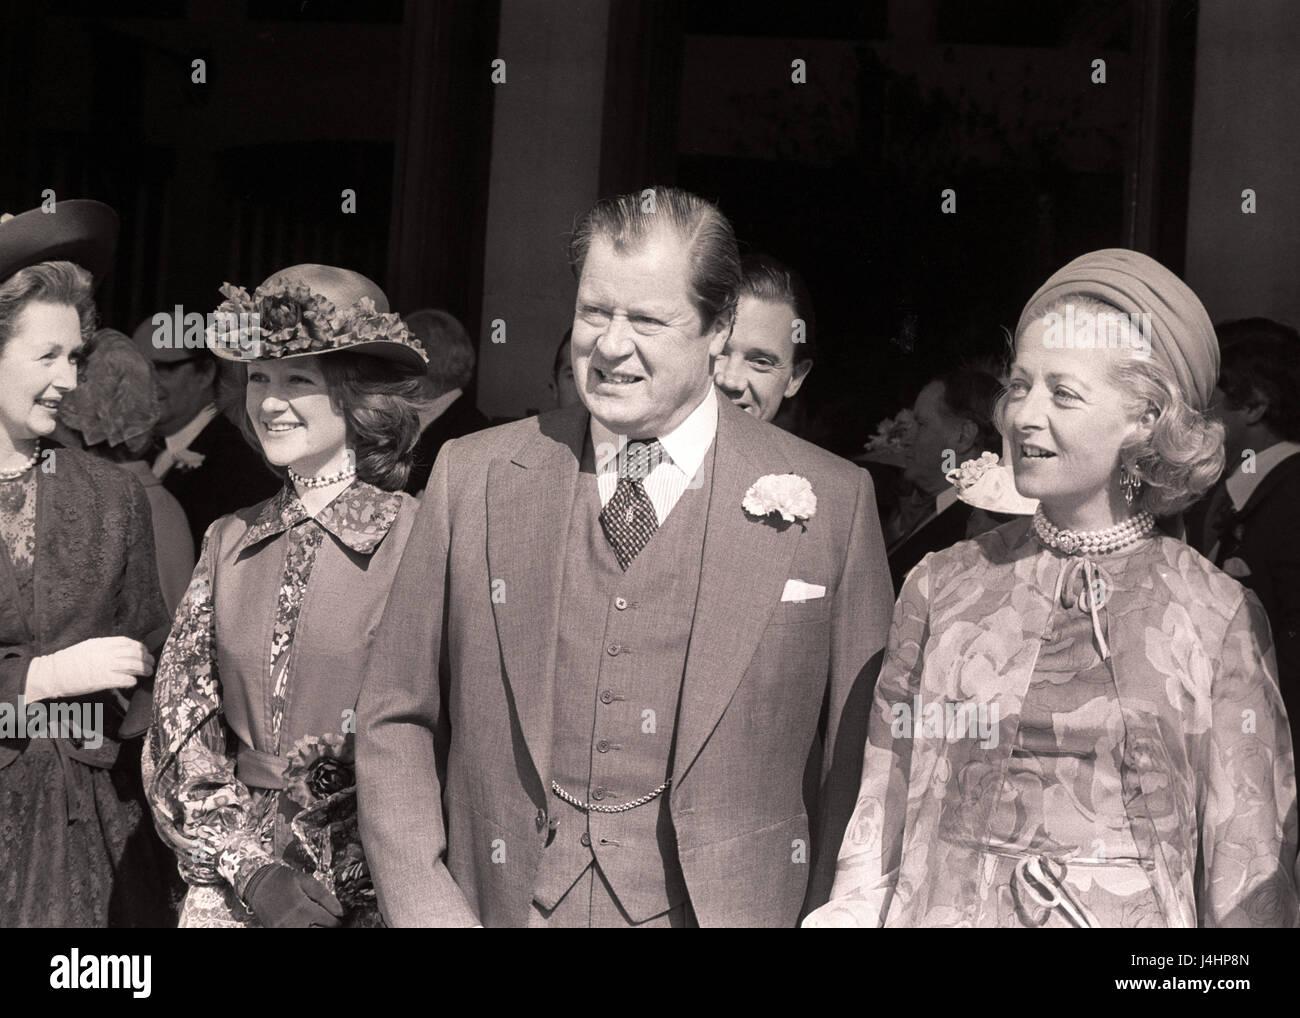 Lady Diana Spencer S Family L R Step Mother Countess Spencer Elder Stock Photo Alamy